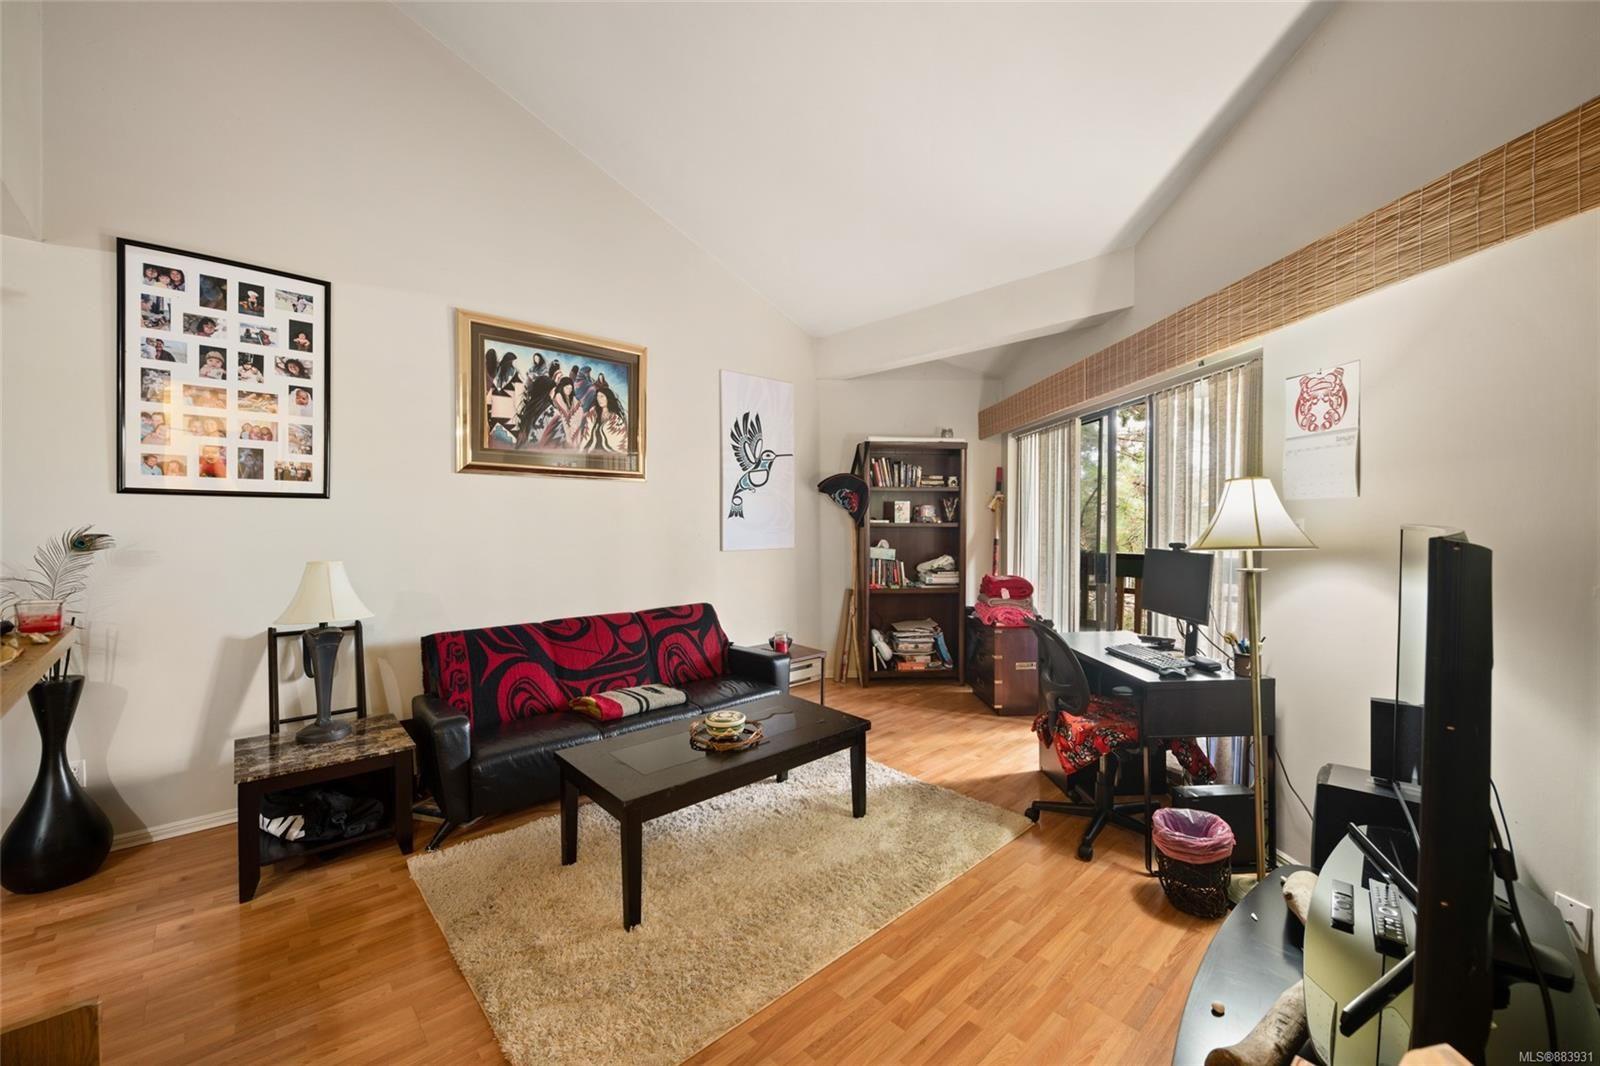 Main Photo: 414 3277 Quadra St in : SE Maplewood Condo for sale (Saanich East)  : MLS®# 883931